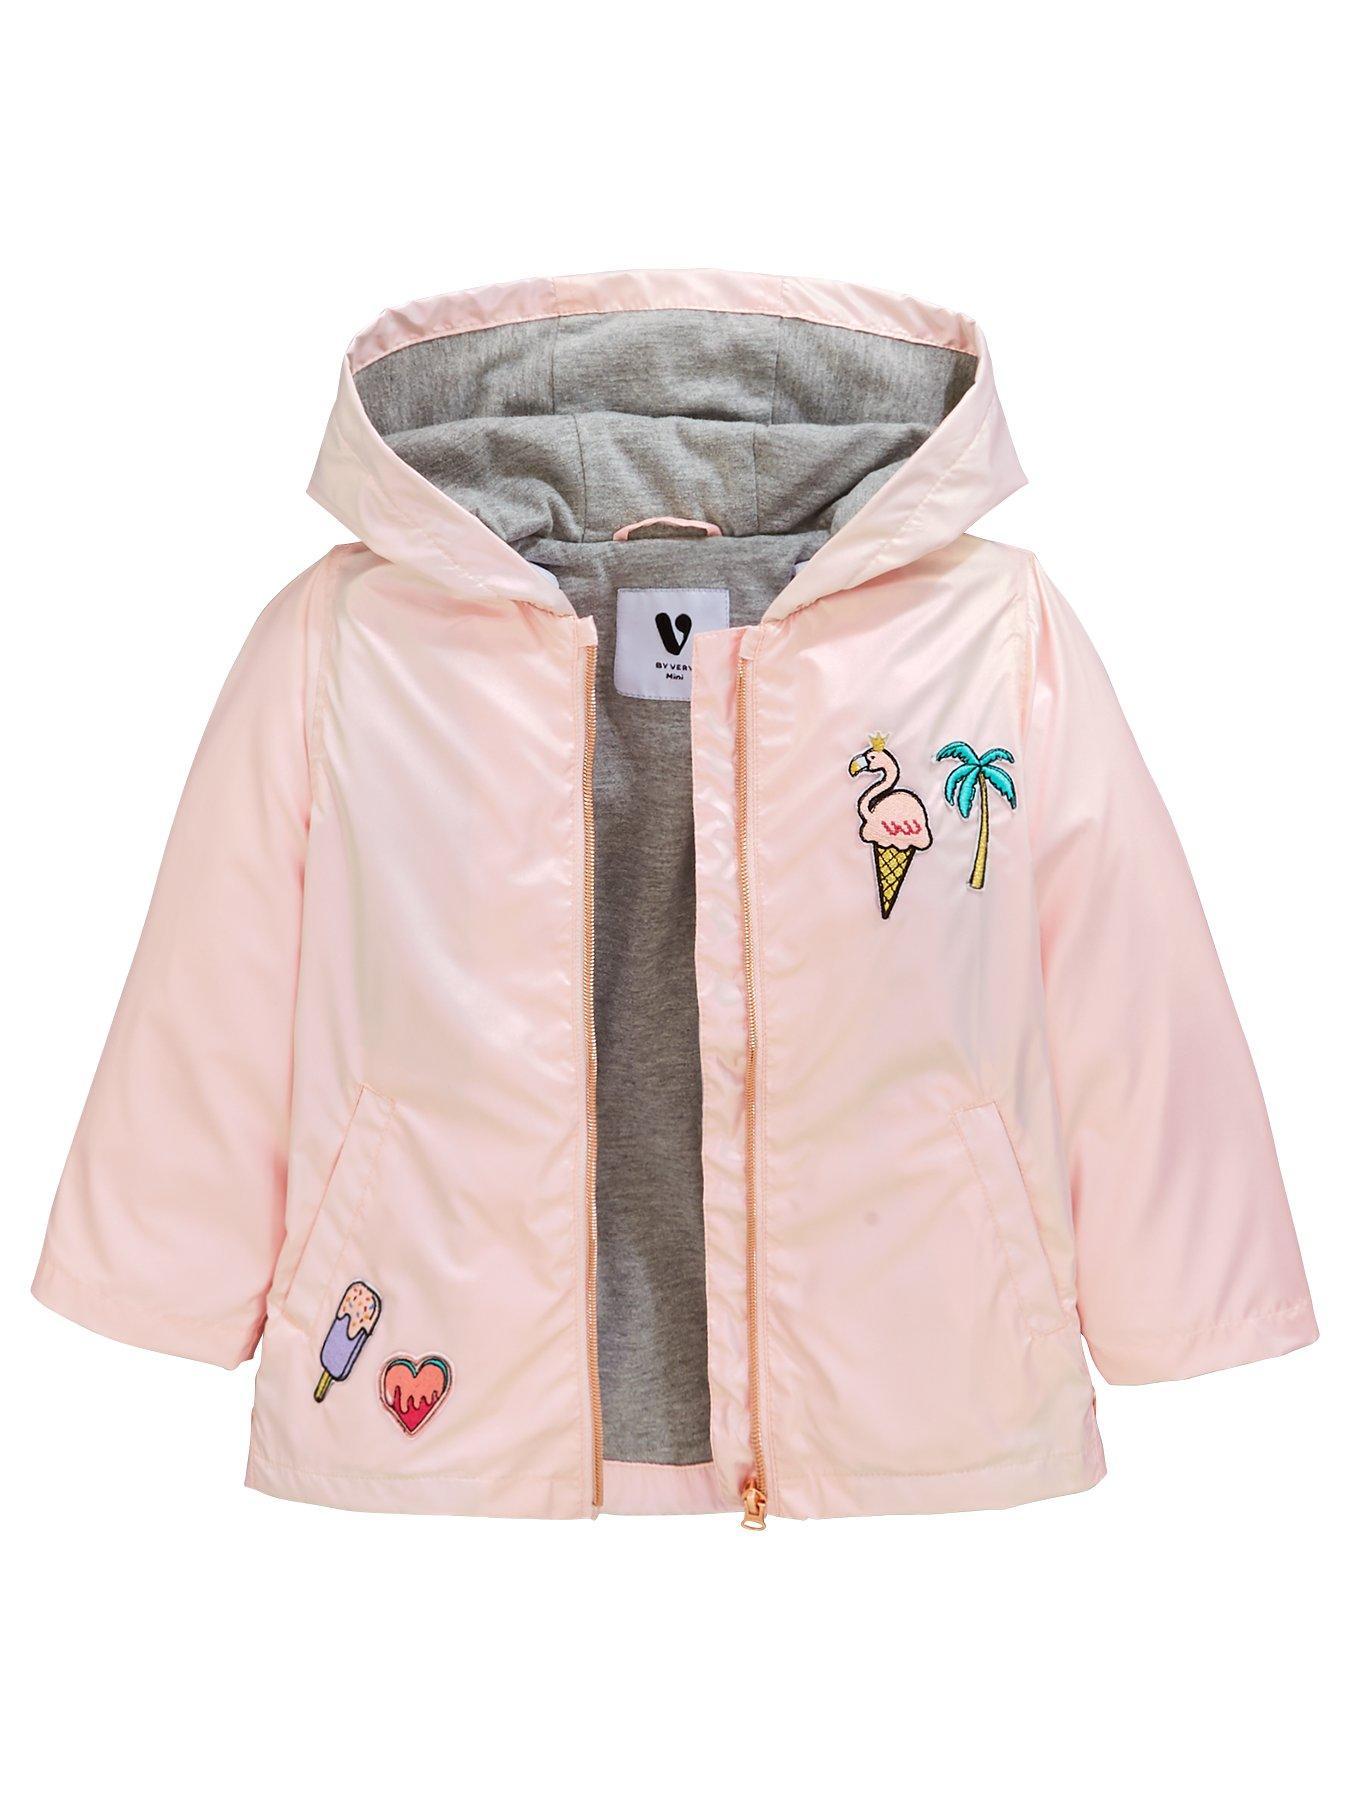 Outerwear Girls' Clothing (newborn-5t) Girls Unicorn Next Jacket Age 6-9 Months